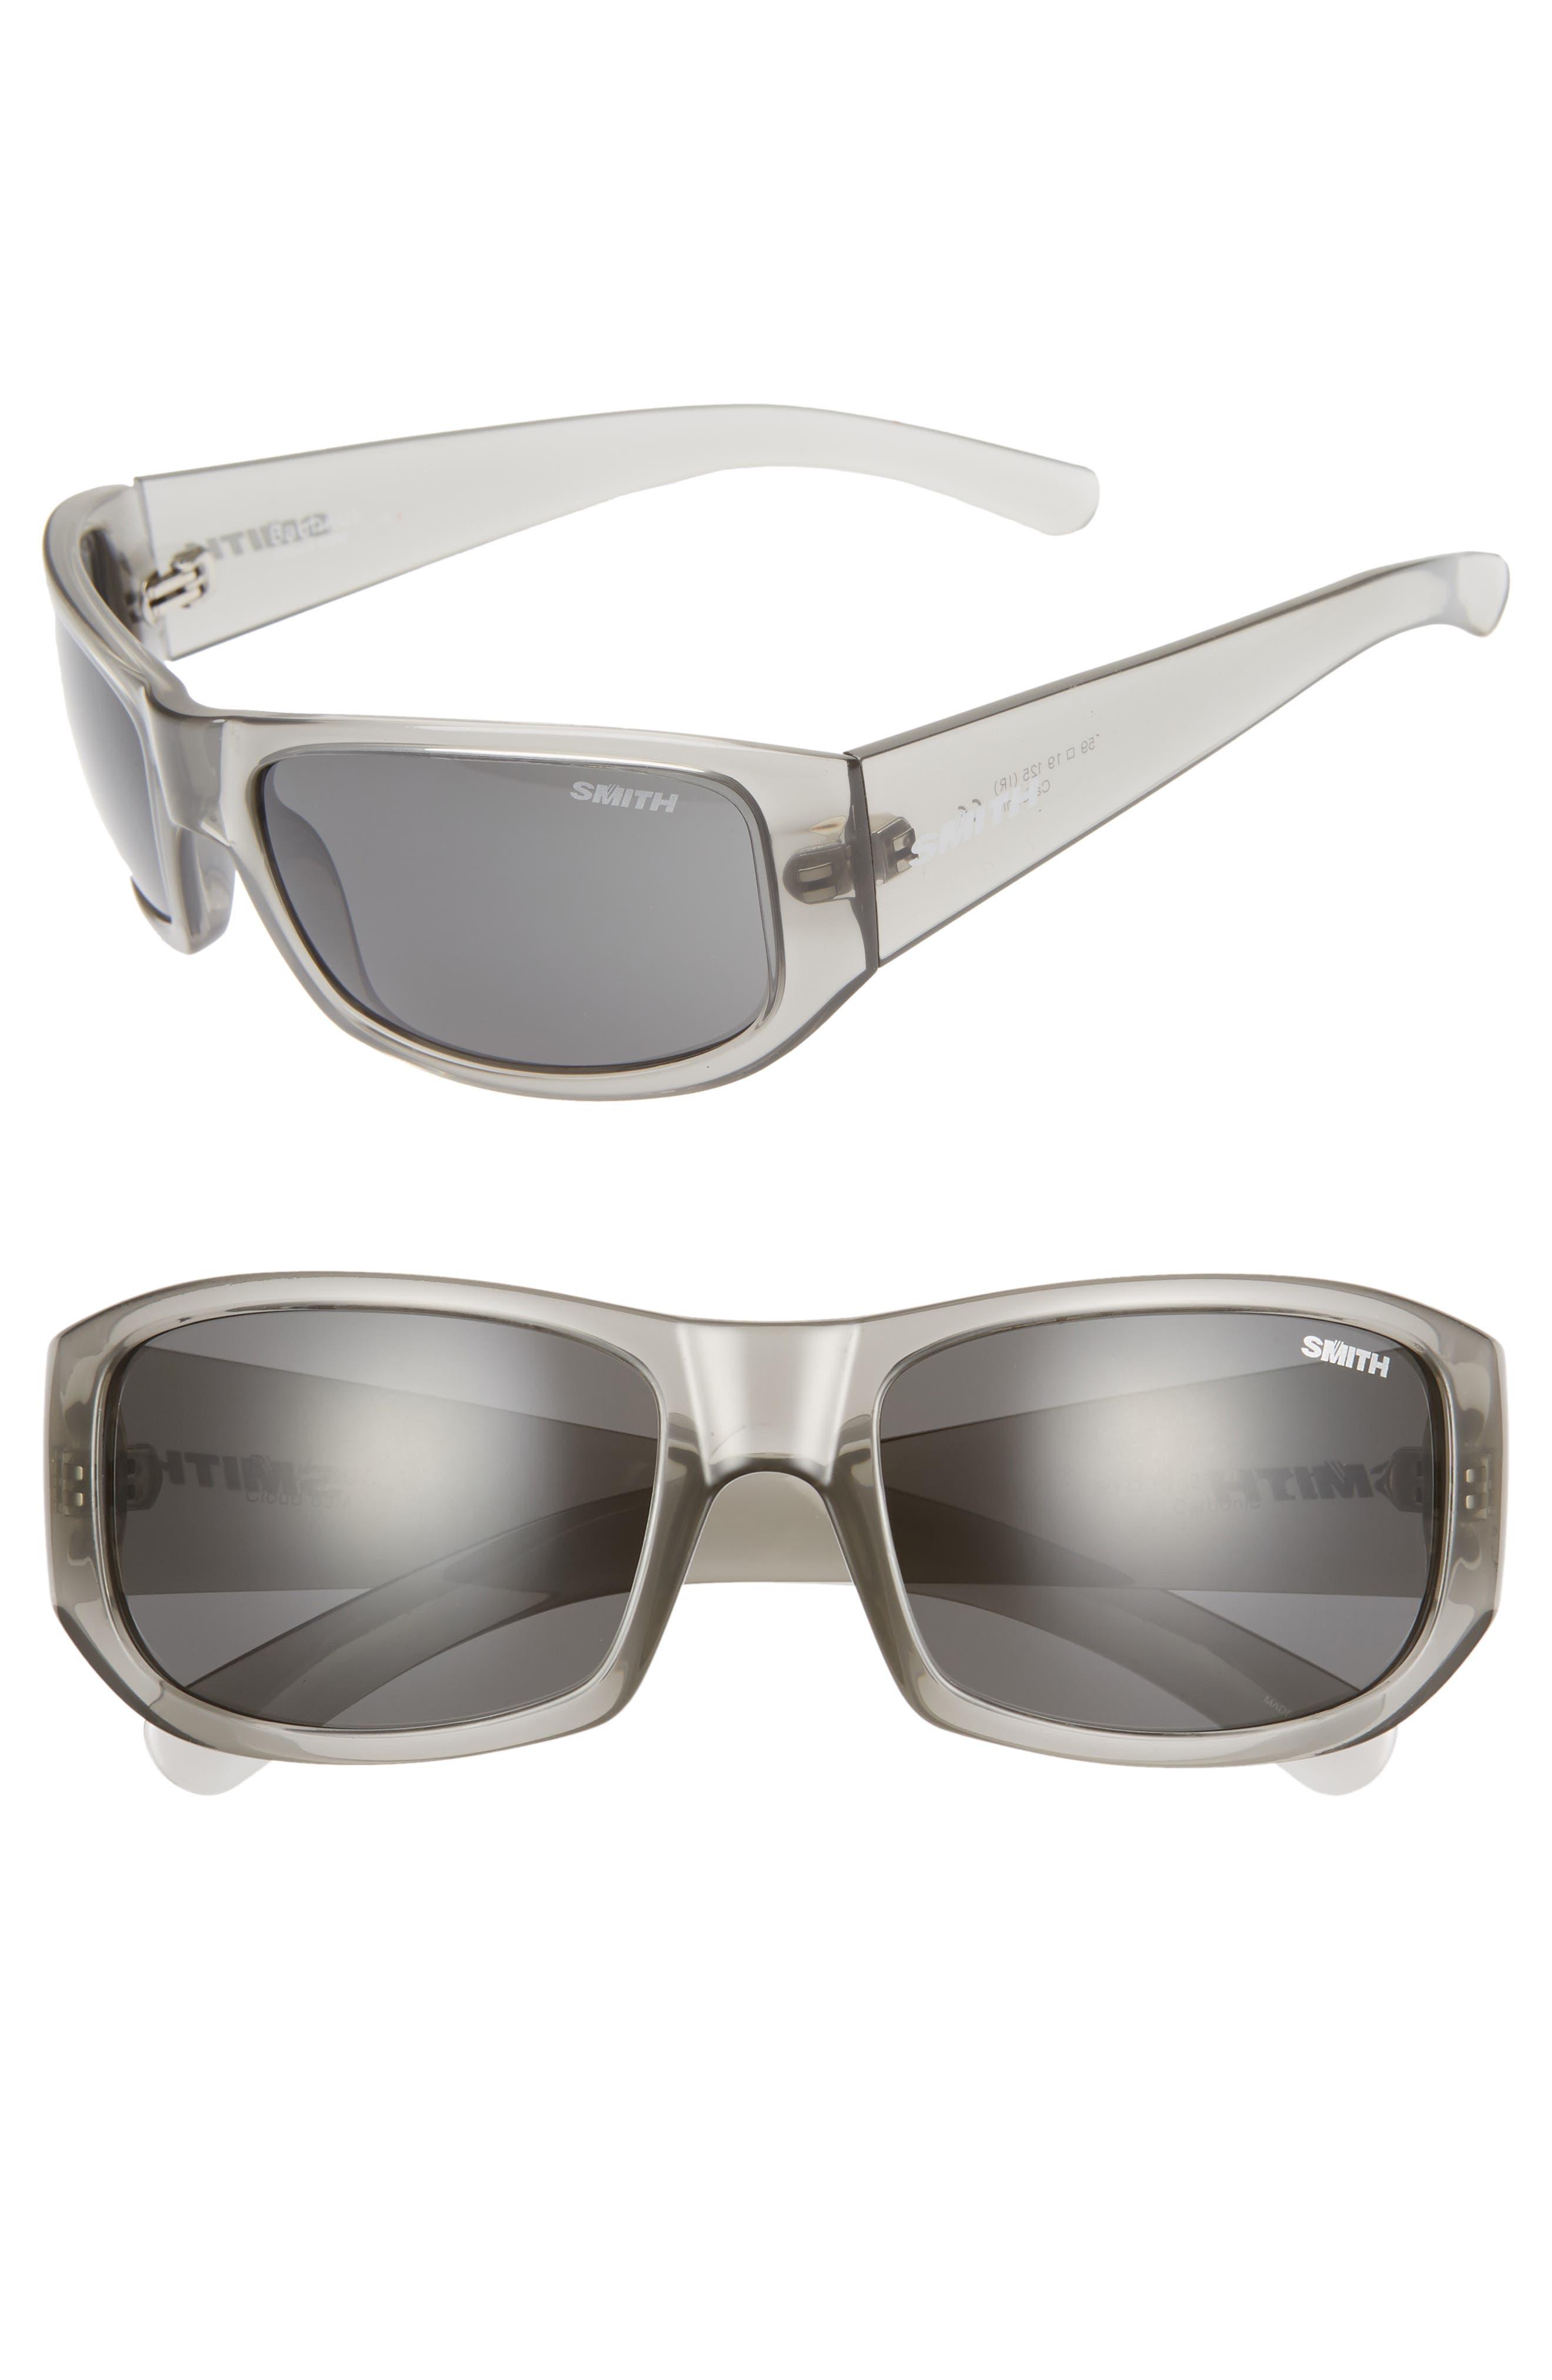 SMITH, Bauhaus 59mm ChromaPop<sup>™</sup> Polarized Wraparound Sunglasses, Main thumbnail 1, color, GREY CLOUD/ GREY